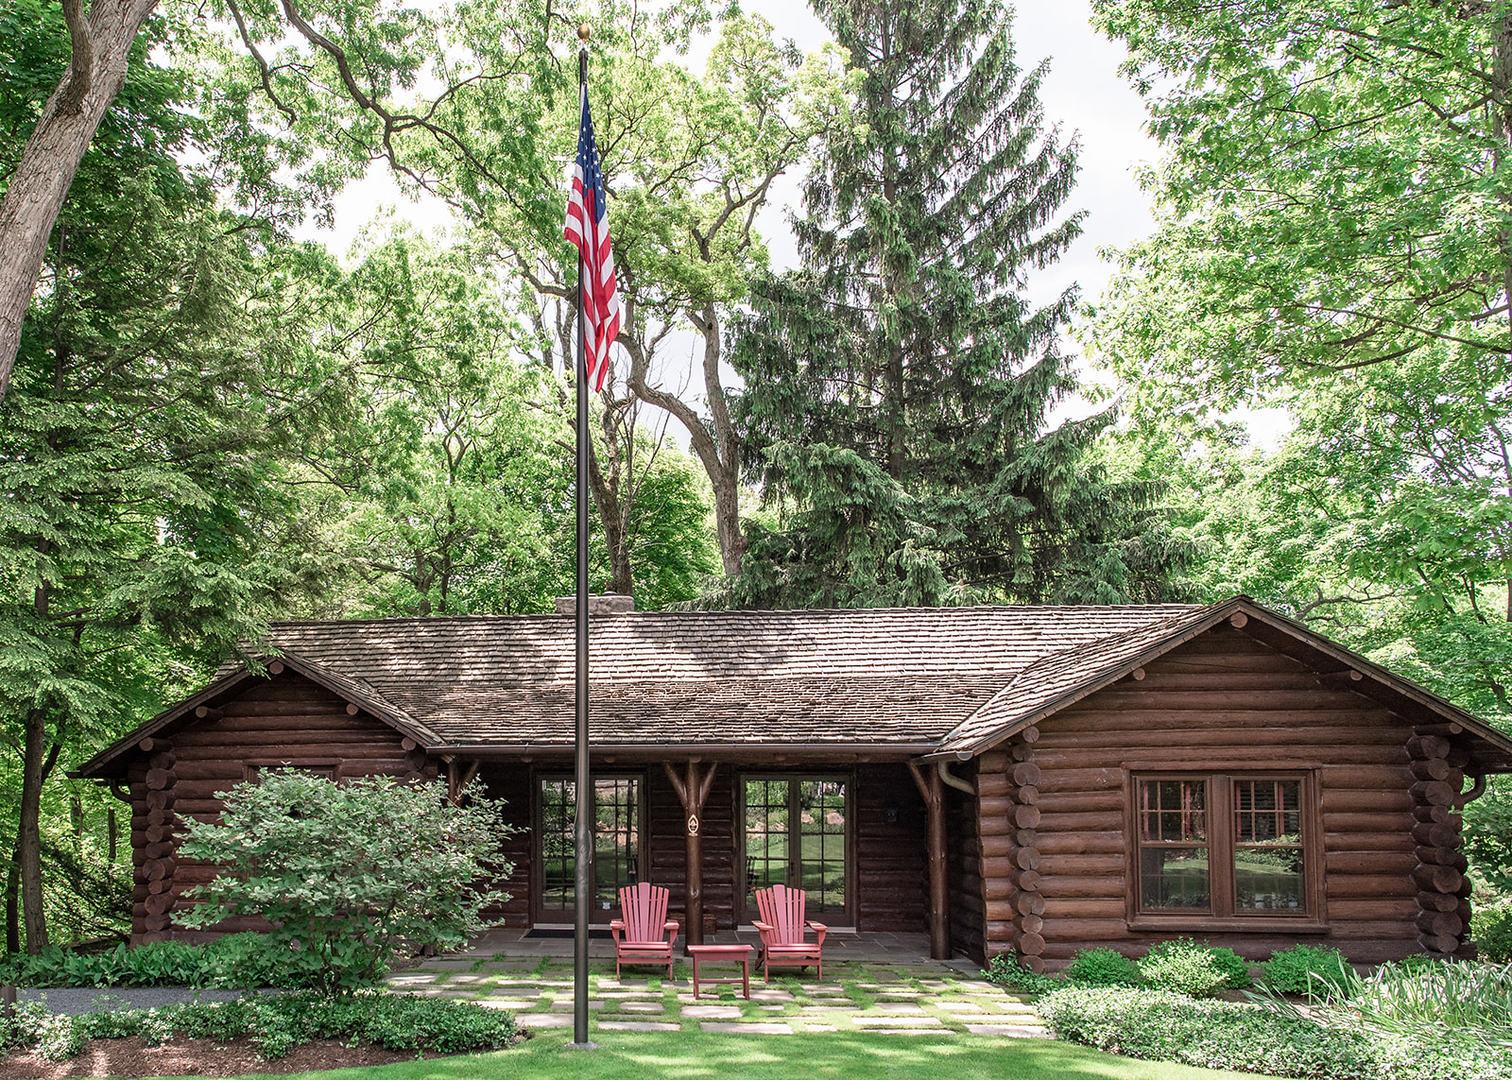 272 South Sheridan, Lake Forest, Illinois, 60045